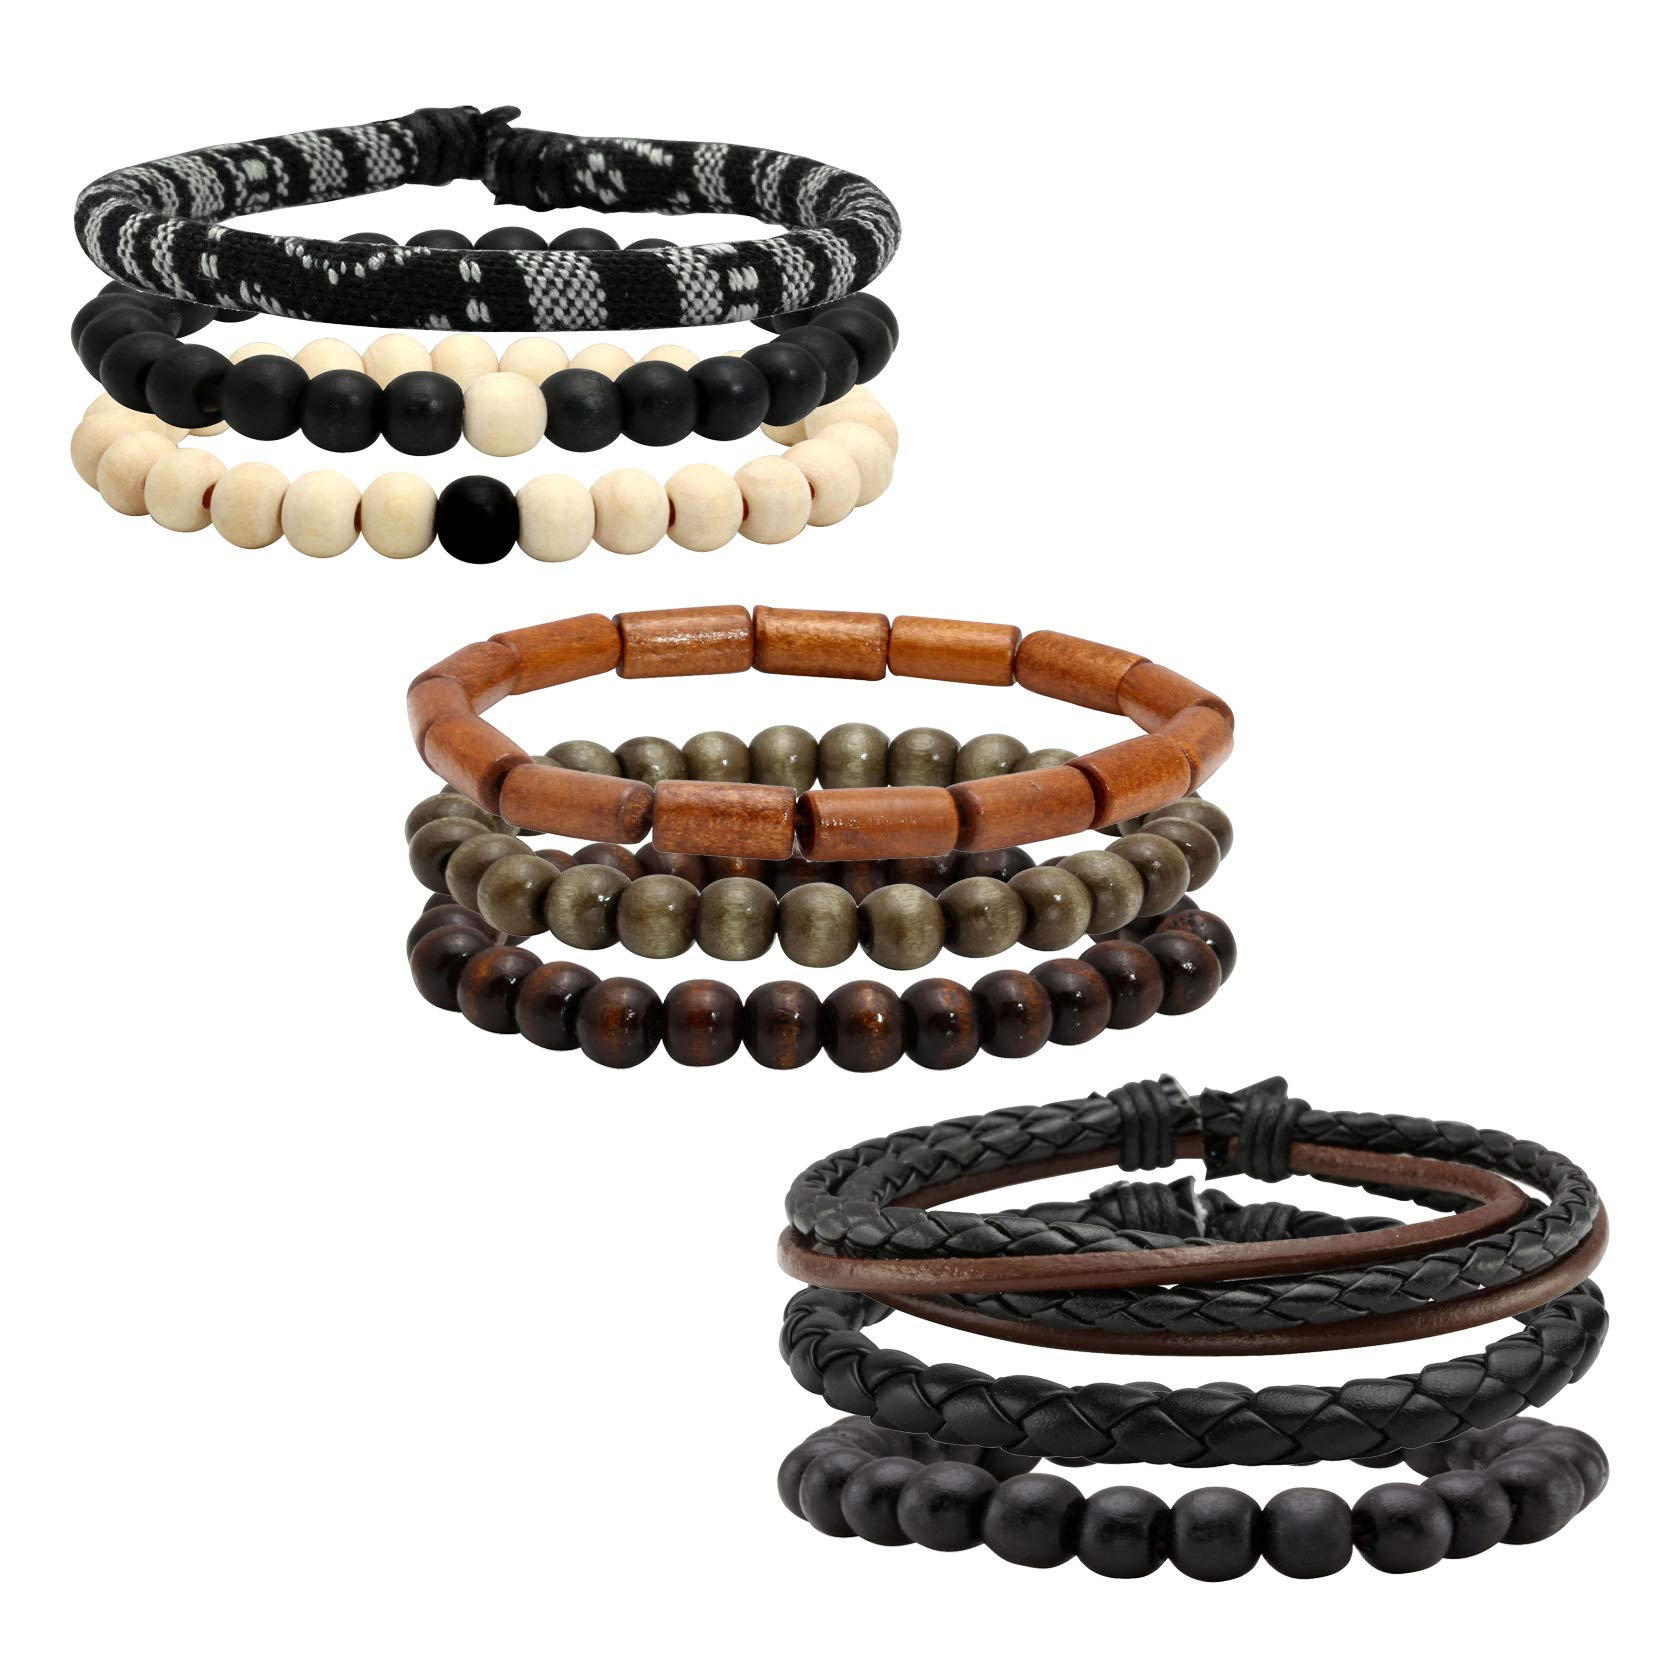 Milakoo 9 Pcs Braided Leather Bracelet for Men Women Cuff Wrap Bracelet Adjustable Black and Brown